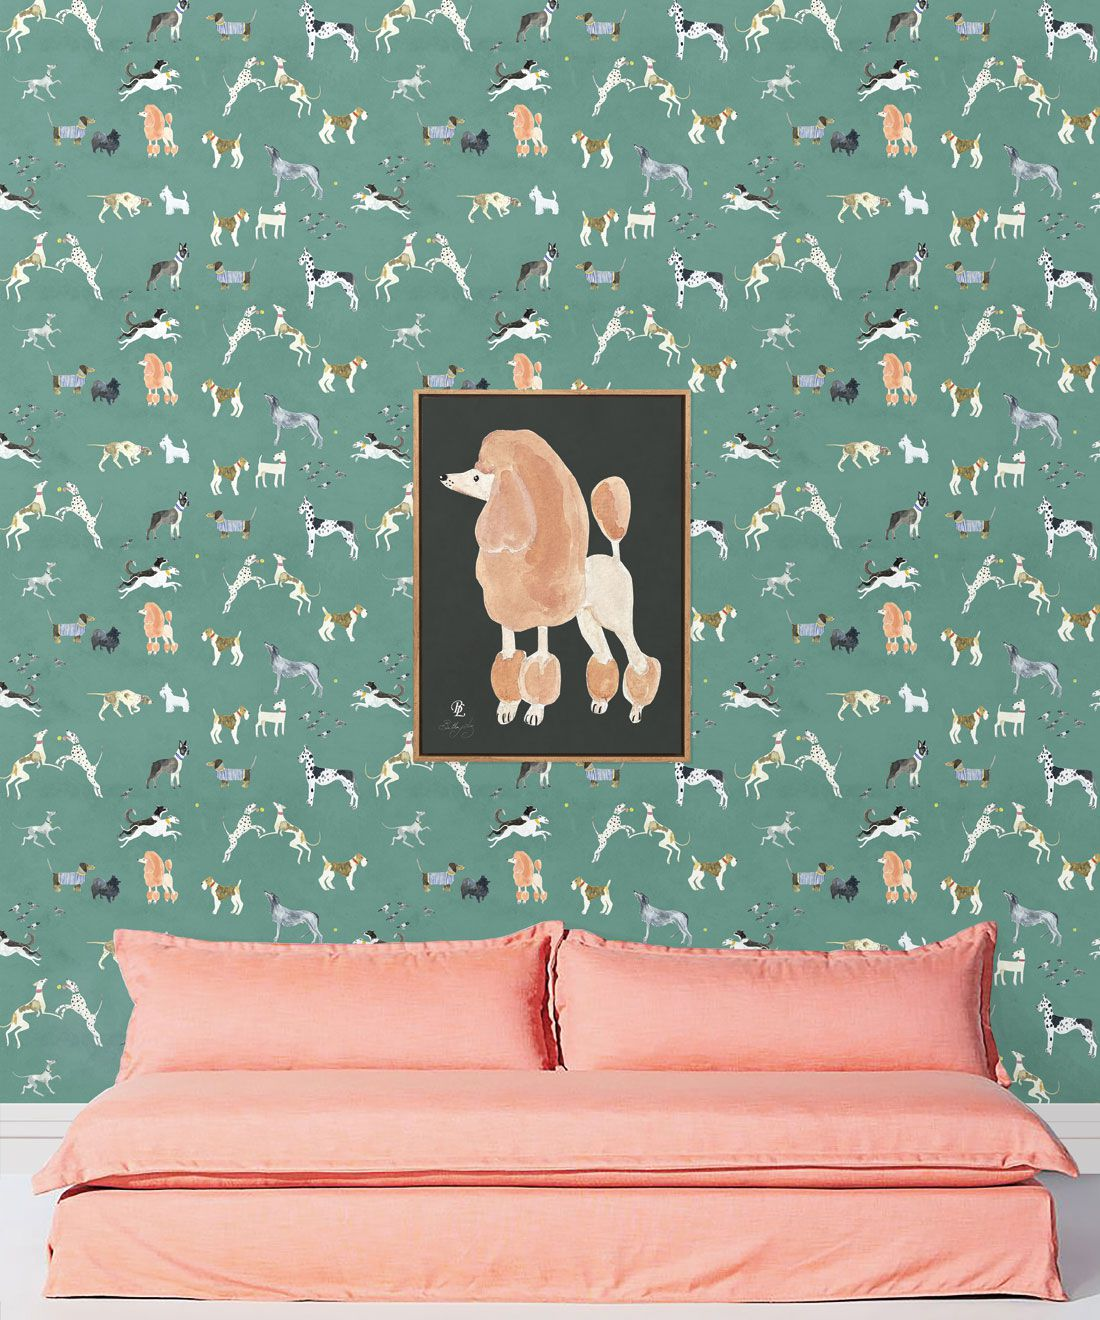 Doggies Wallpaper •Dog Wallpaper •Turquoise • Insitu with salmon colored sofa